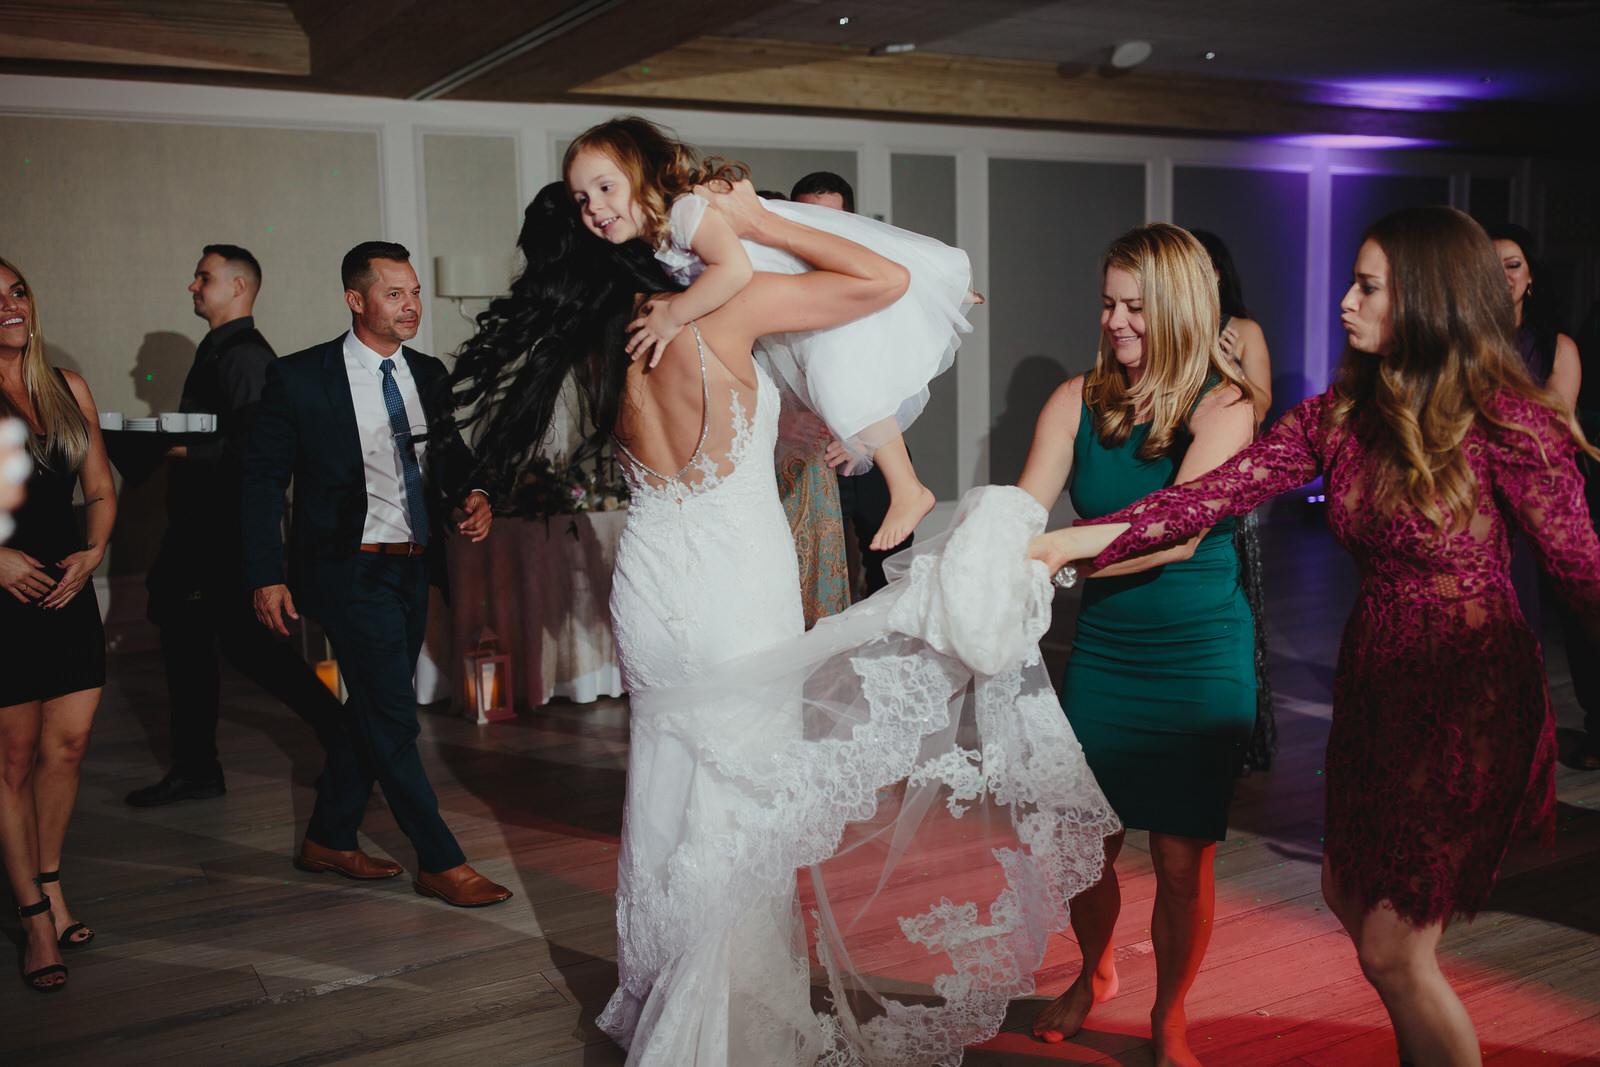 fun_moments_tiny_house_photo_weddings.jpg